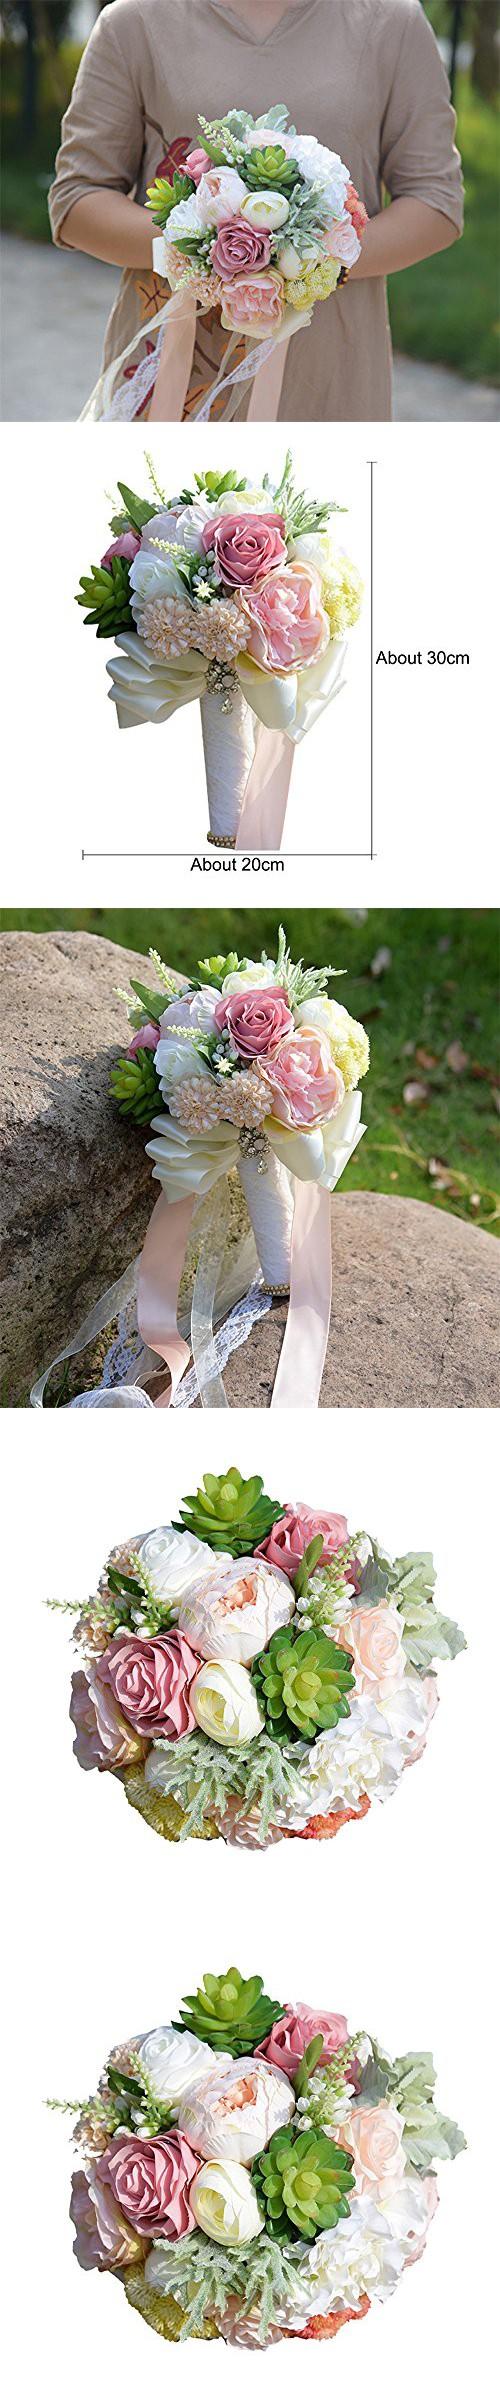 Kuki shop handmade creative flowers and succulent plants wedding kuki shop handmade creative flowers and succulent plants wedding bouquet bridal holding bouquet bridal throw bouquet izmirmasajfo